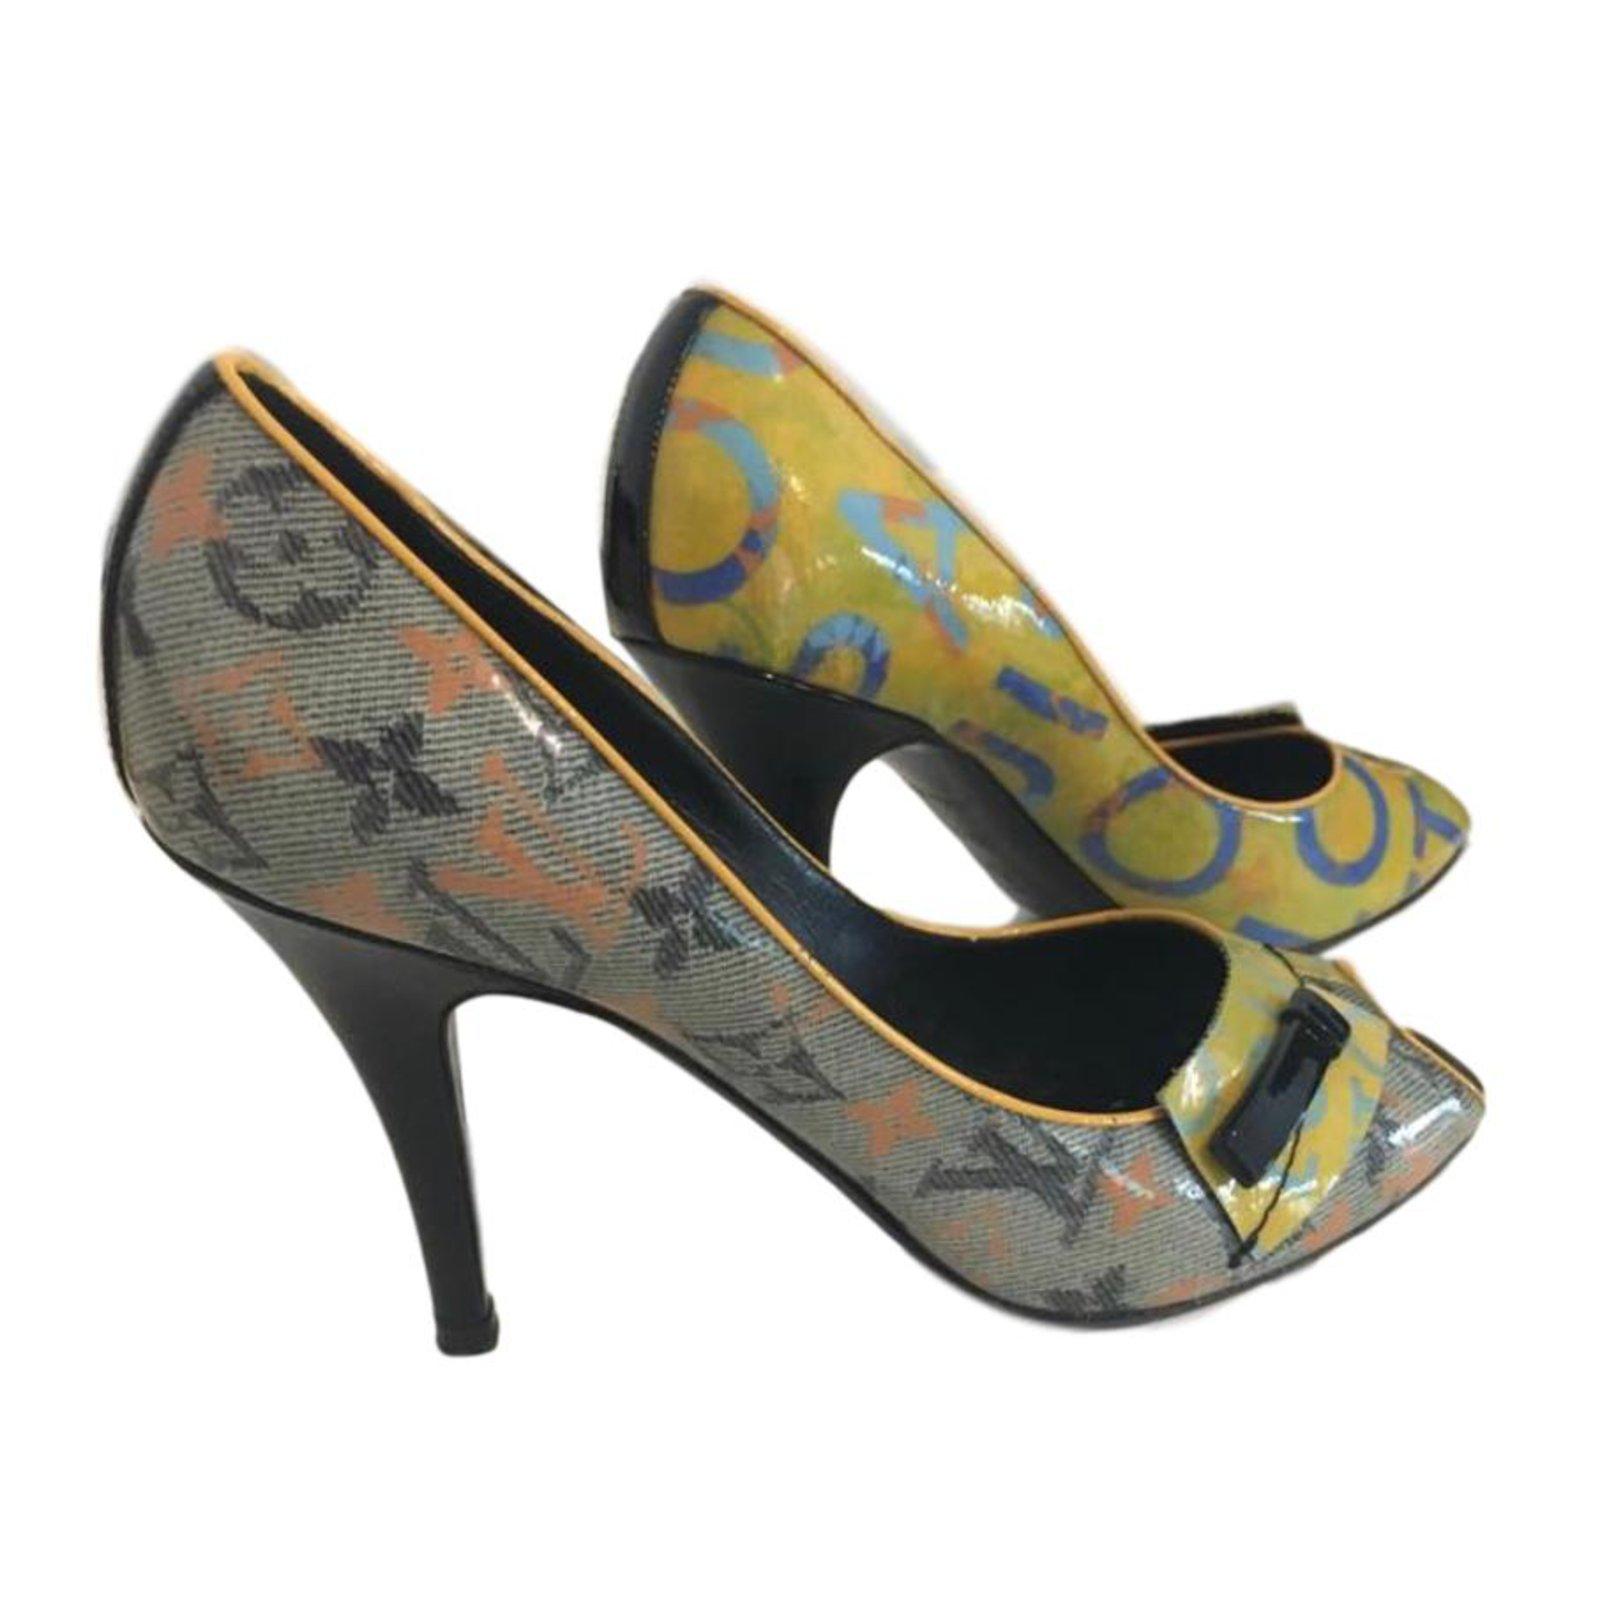 big discount uk store san francisco Louis Vuitton Mongogram peep toe Heels Patent leather Beige ref ...